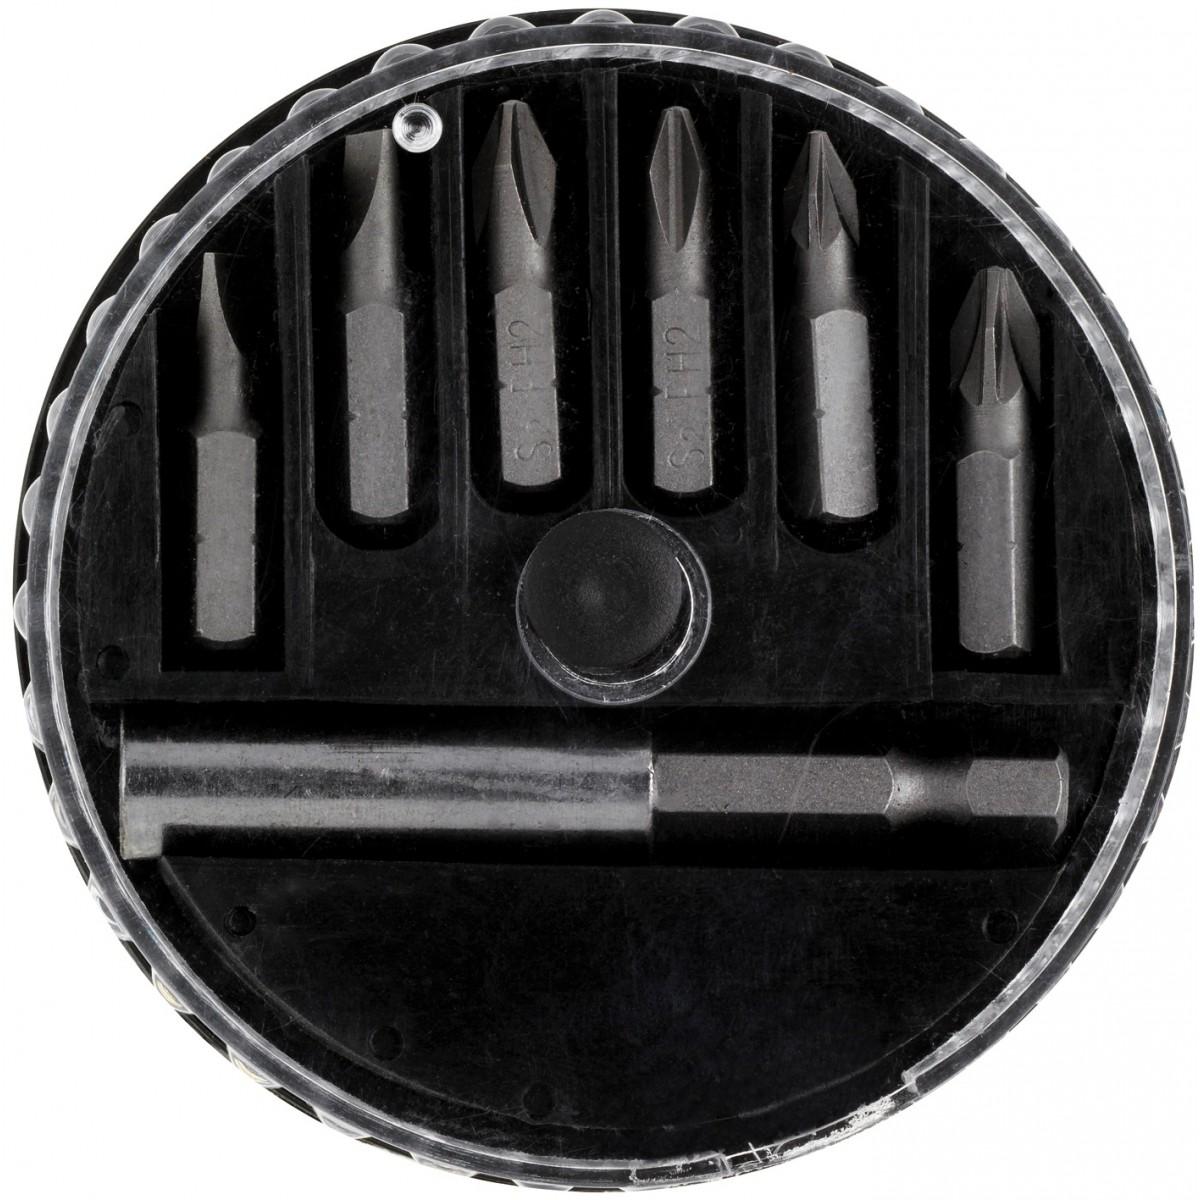 Set 6 embouts 25 mm S2 SCID - 7 pièces